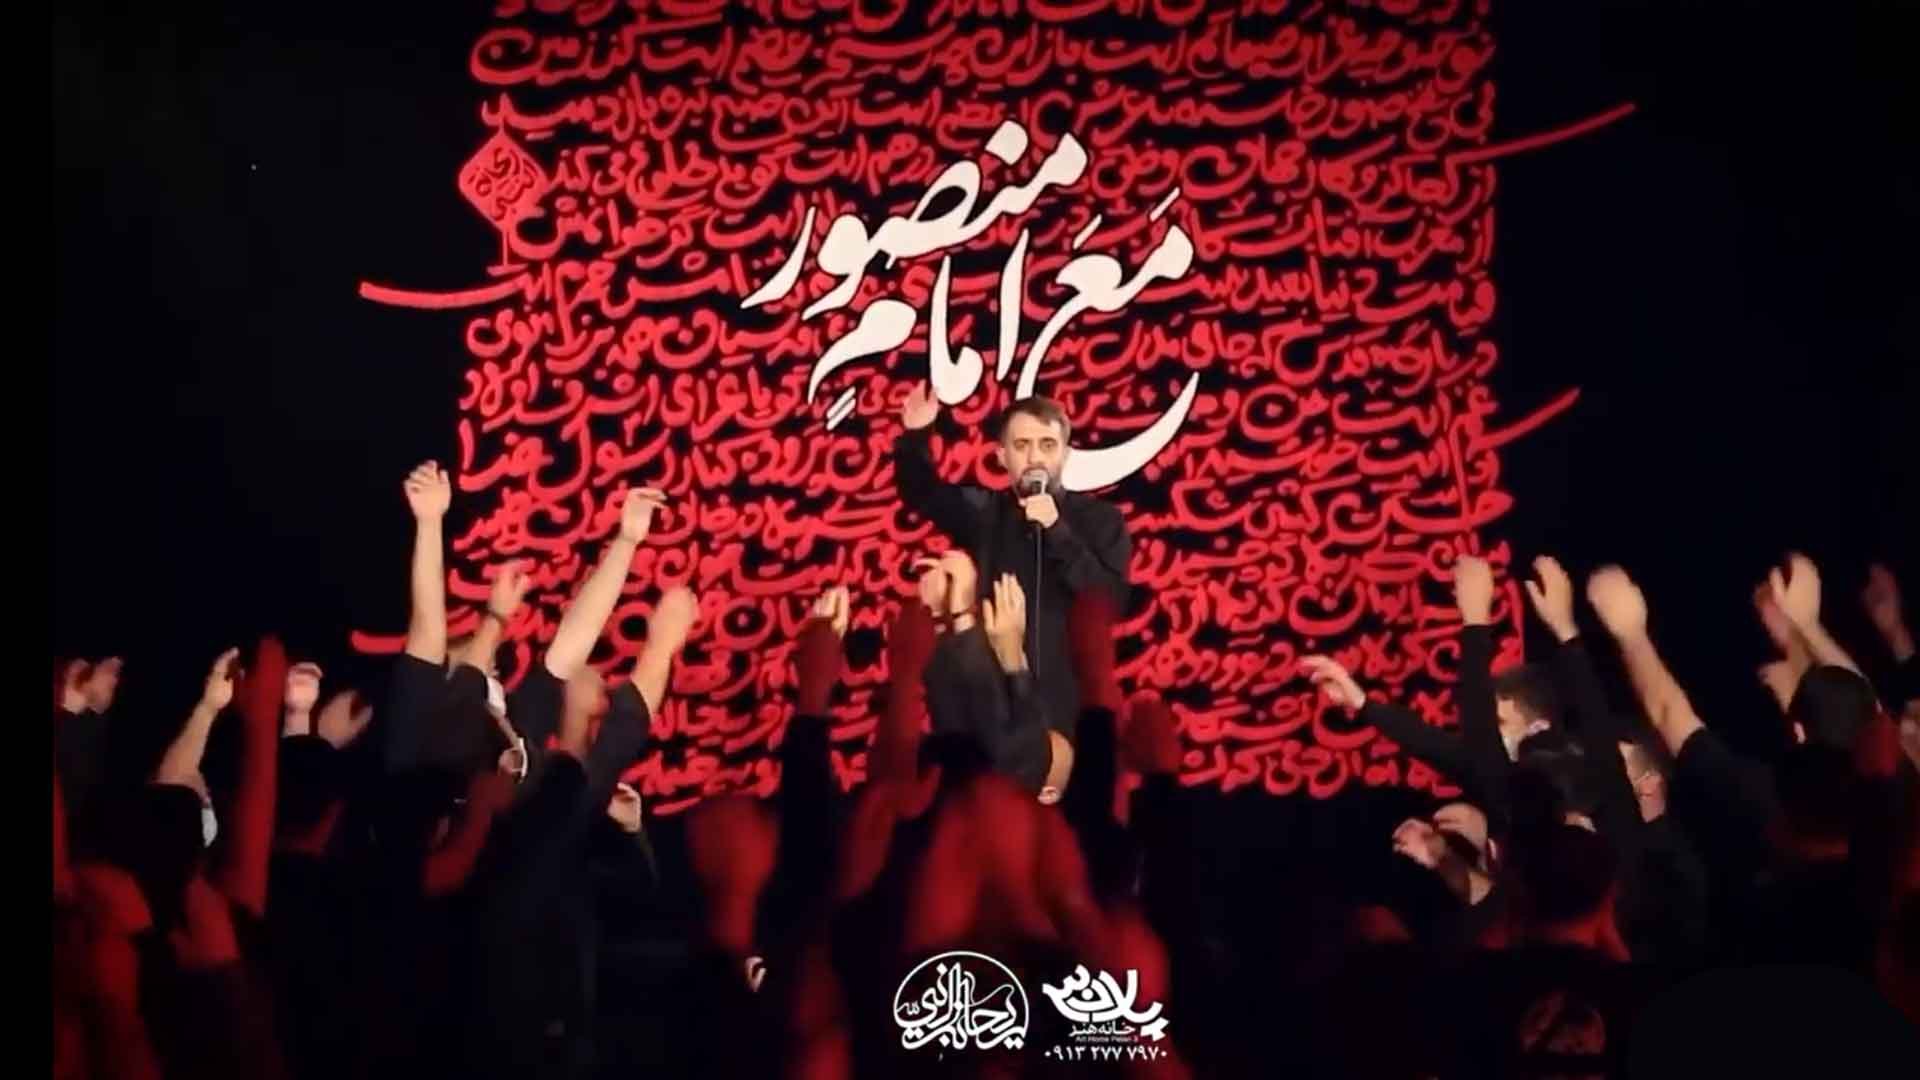 hosein-gharib-mohammad-hosein-poyanfar